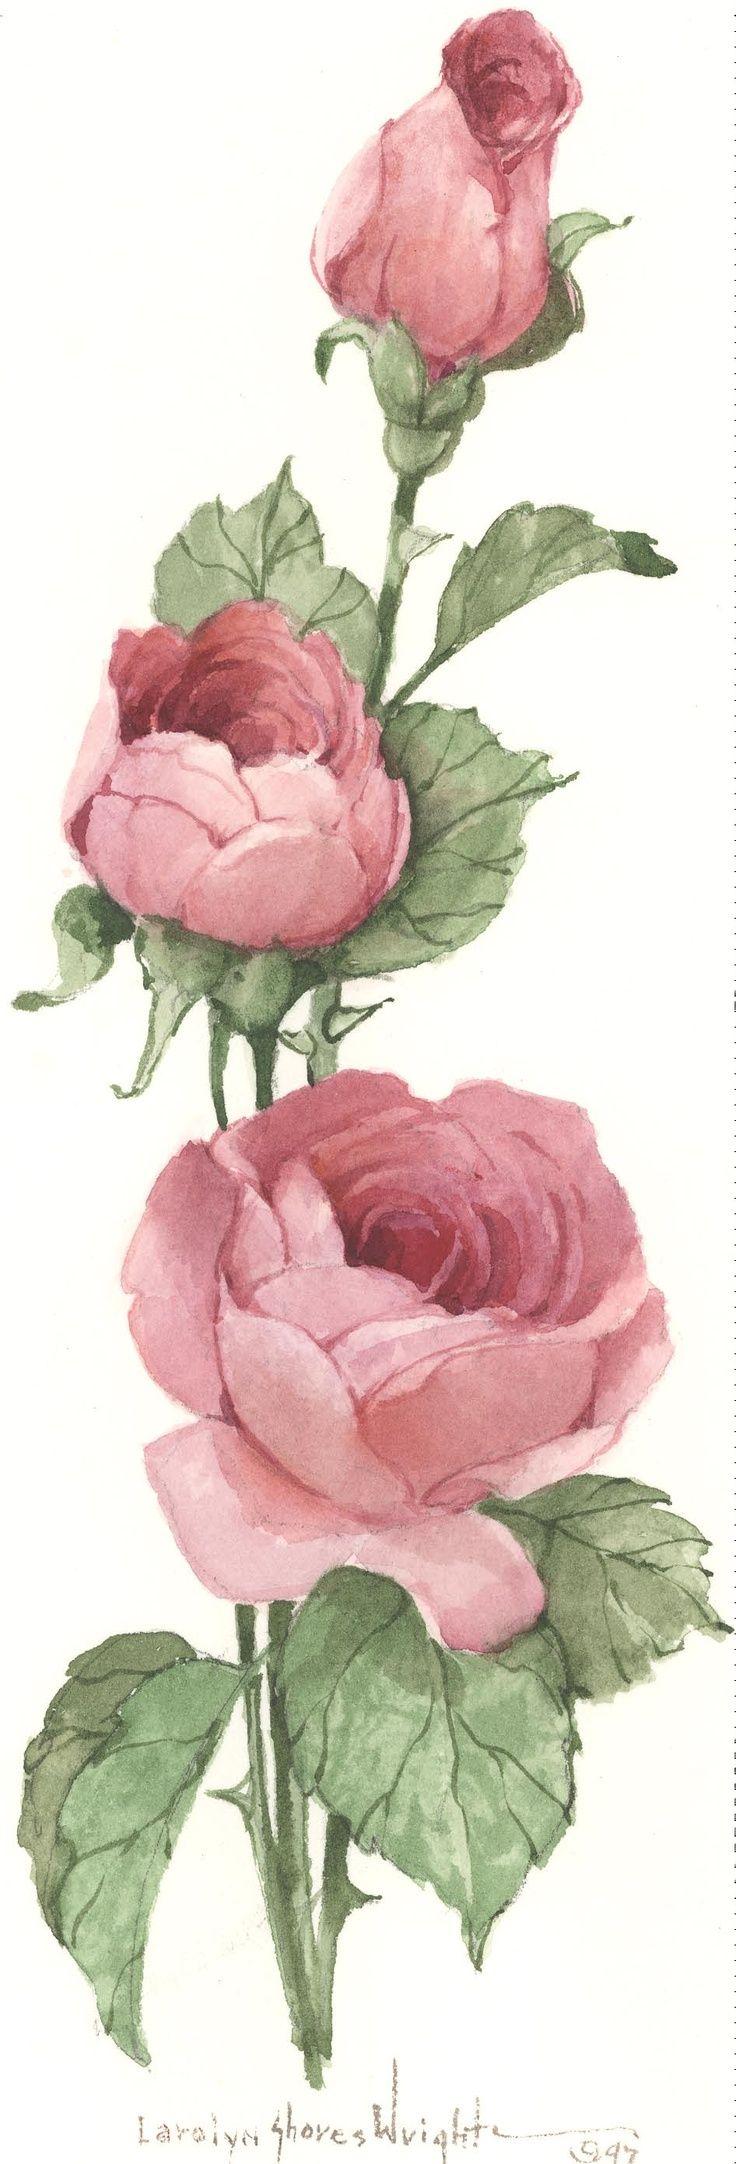 Pink & Green Essence ✦  ✦ https://www.pinterest.com/sclarkjordan/pink-green-essence/